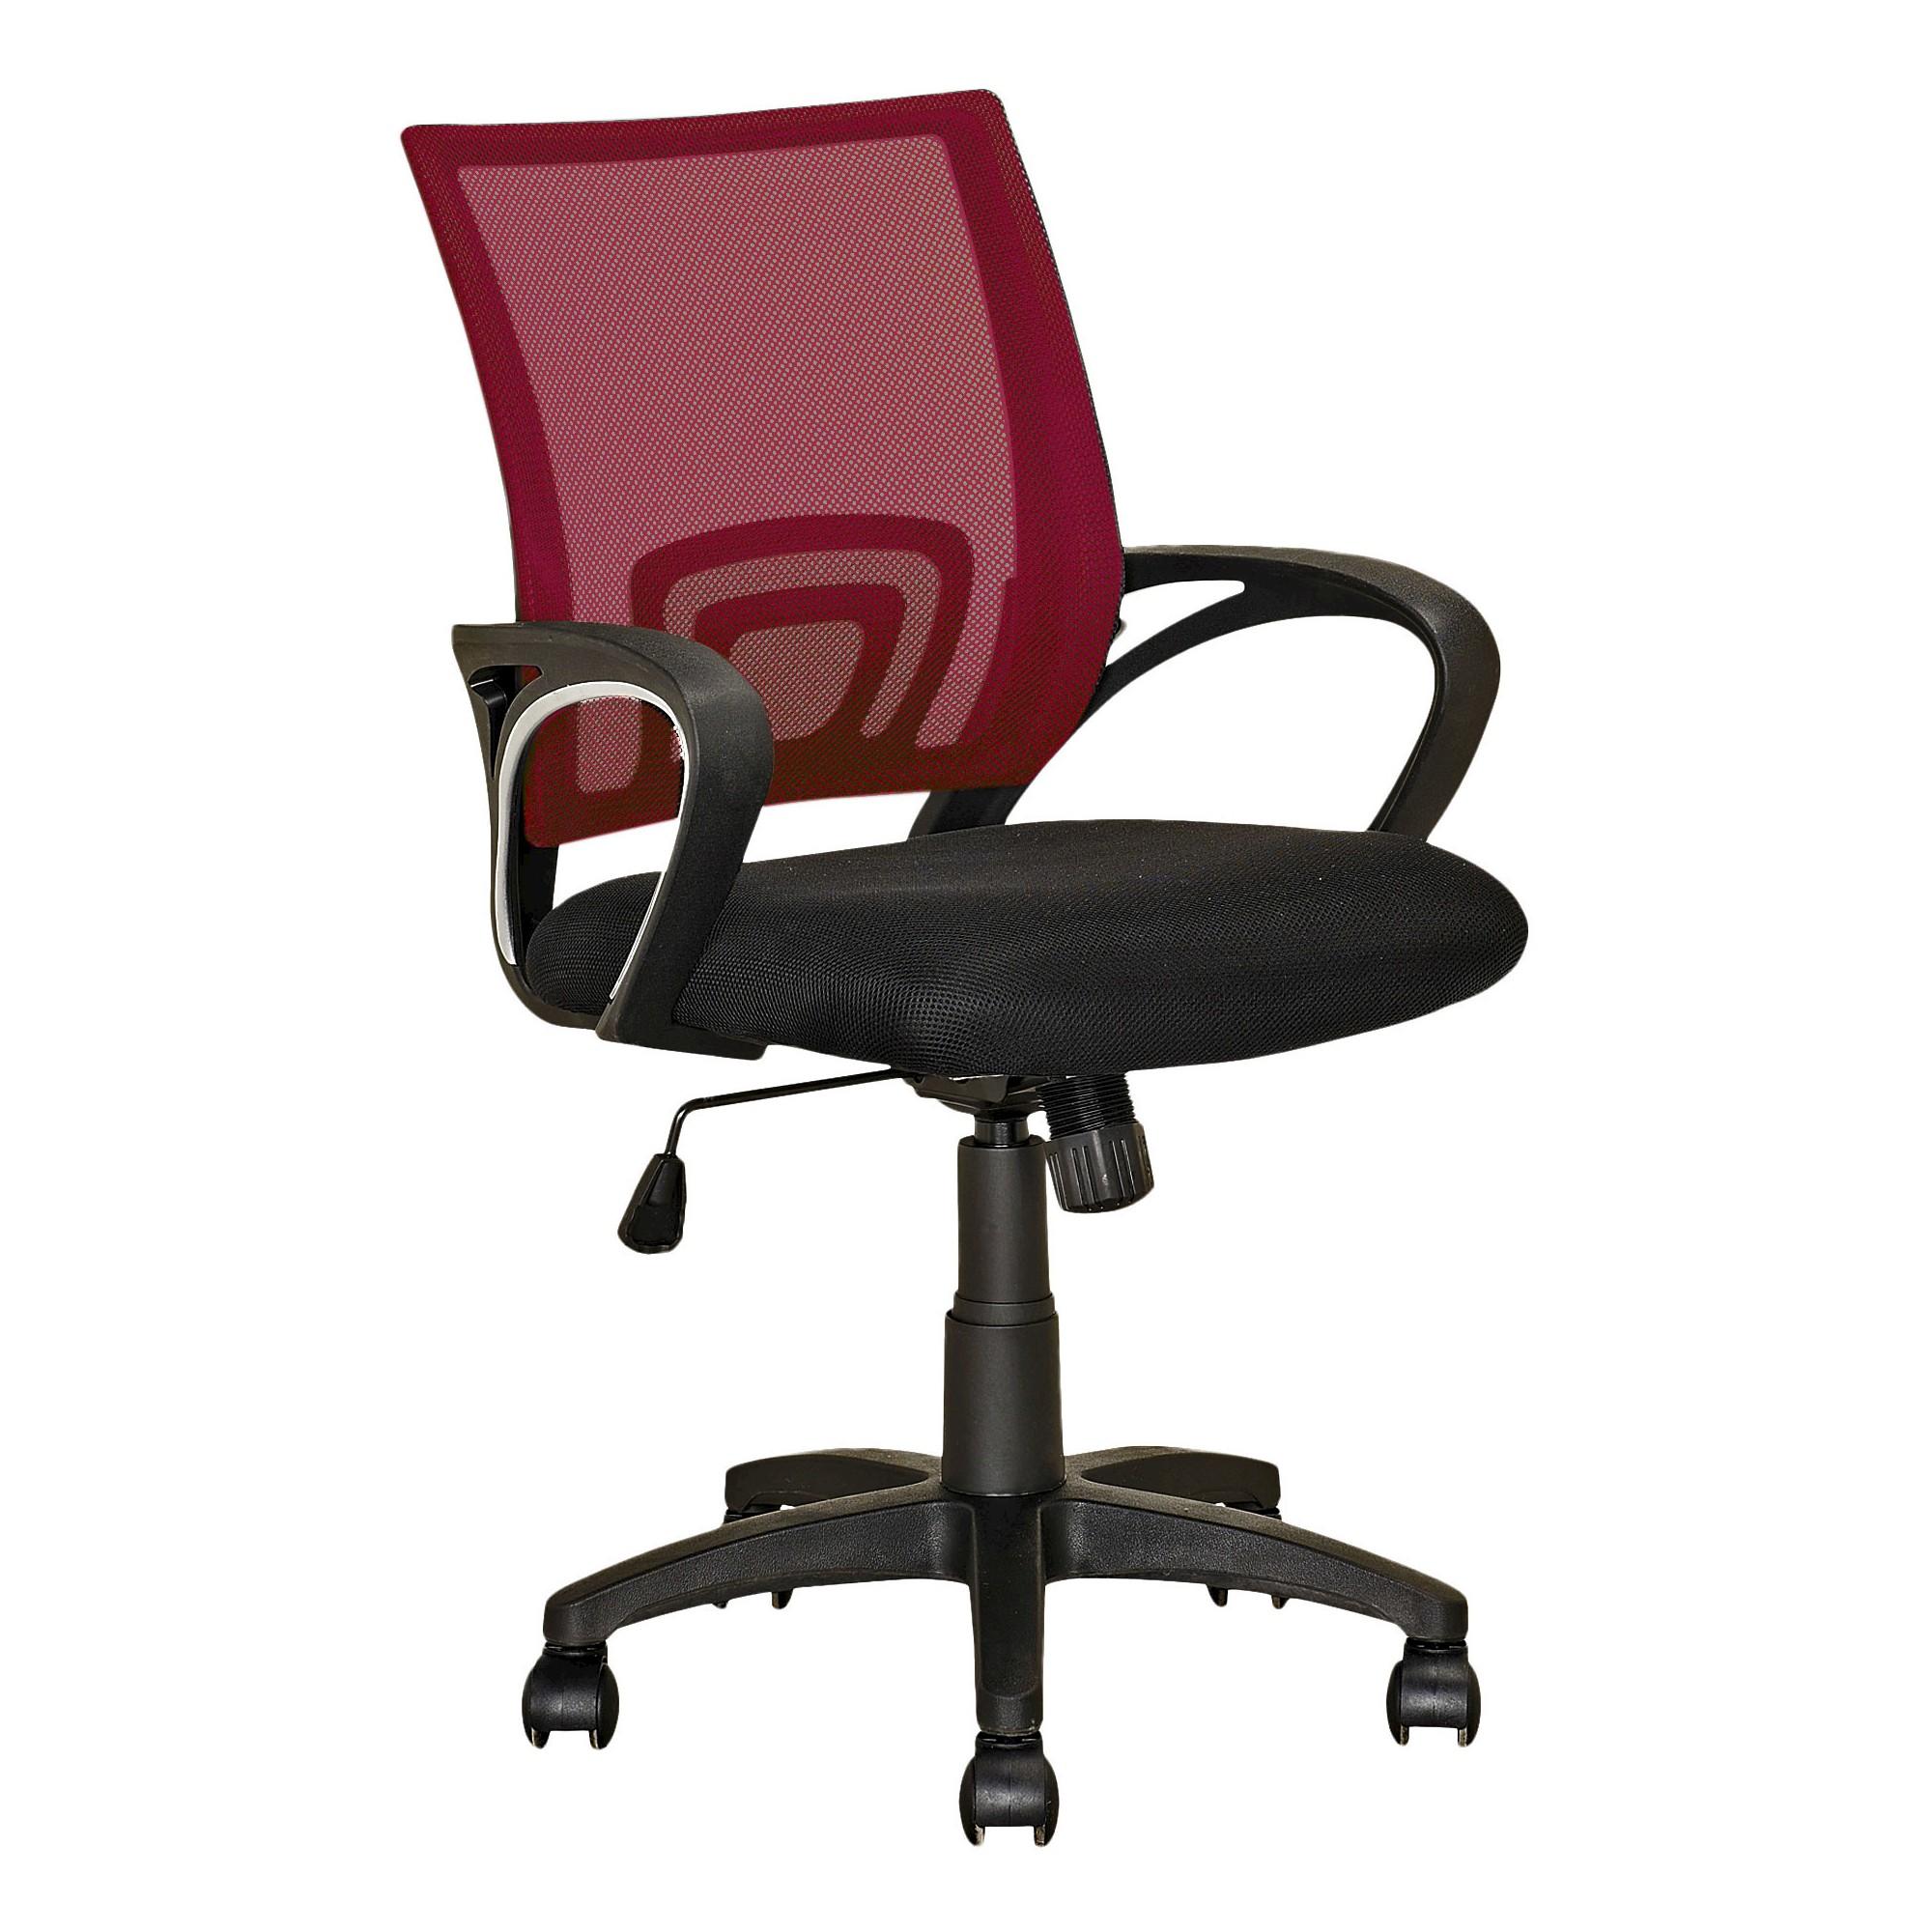 Workspace Mesh Back Office Chair Maroon CorLiving